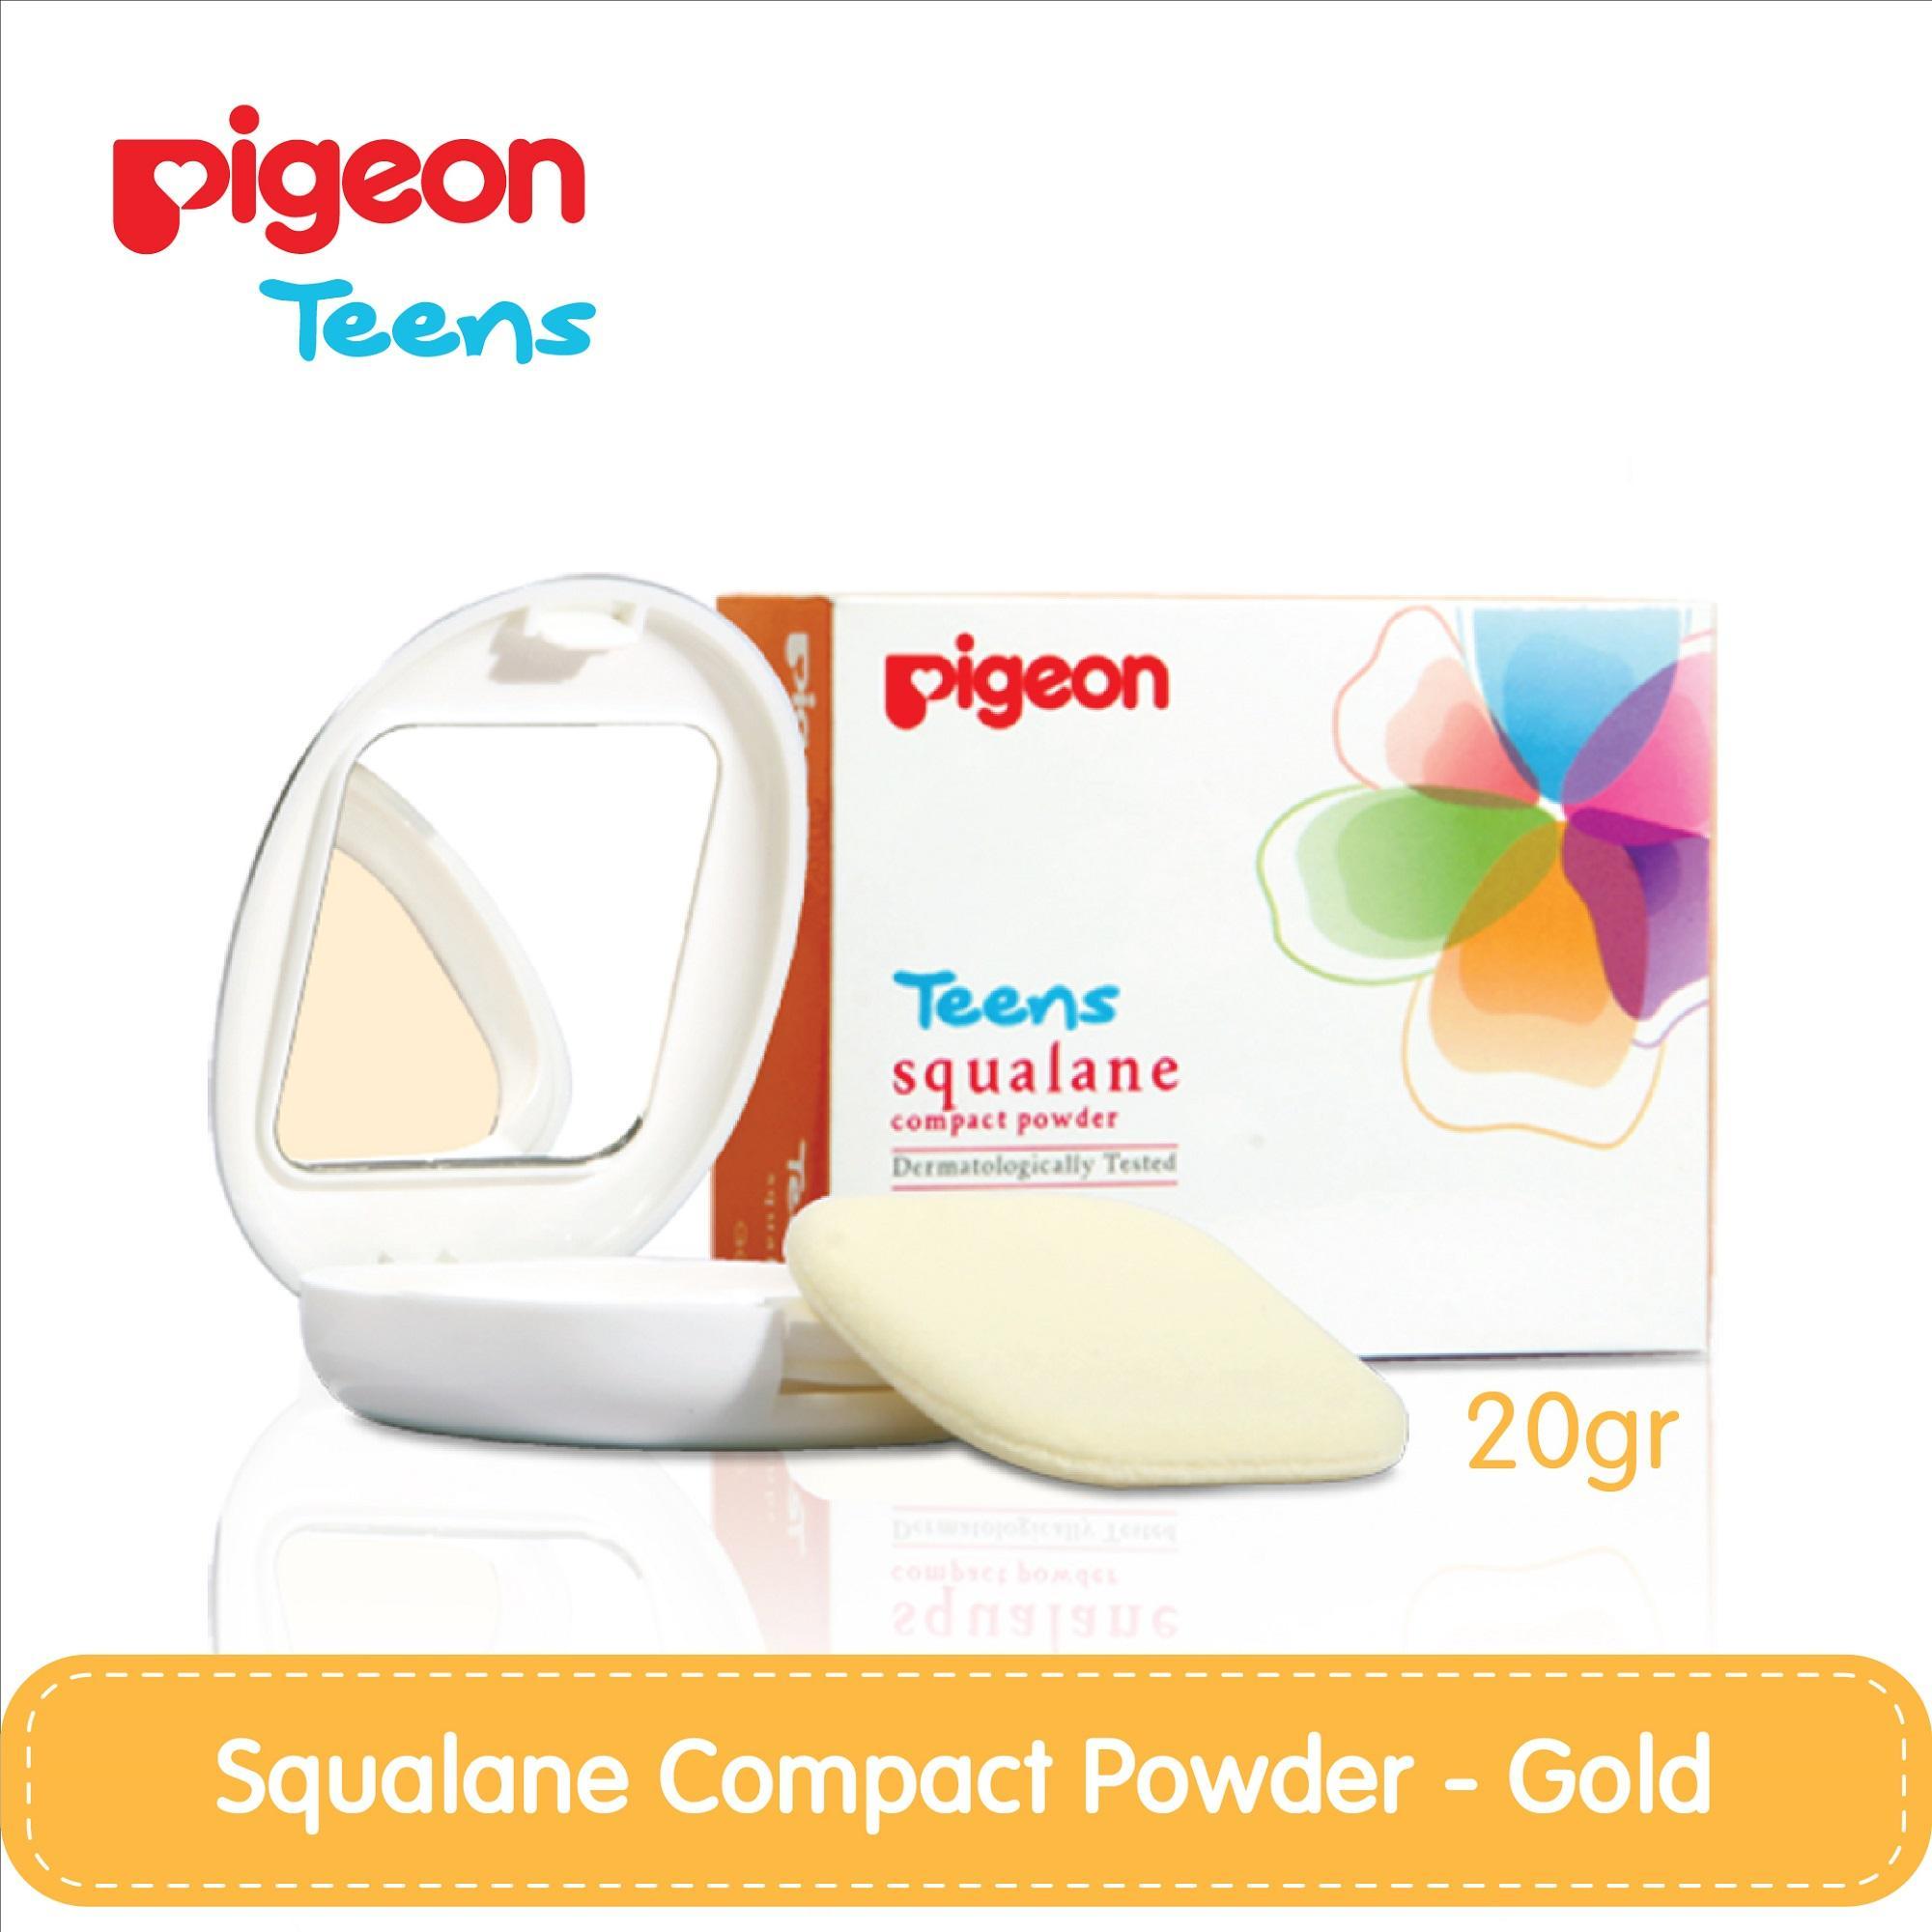 Cek Harga Baru Bedak Glutacol Gold Terkini Situs Pembanding Cc Powder Original Pigeon Compact Squalane 20gr Remaja Pgt0014